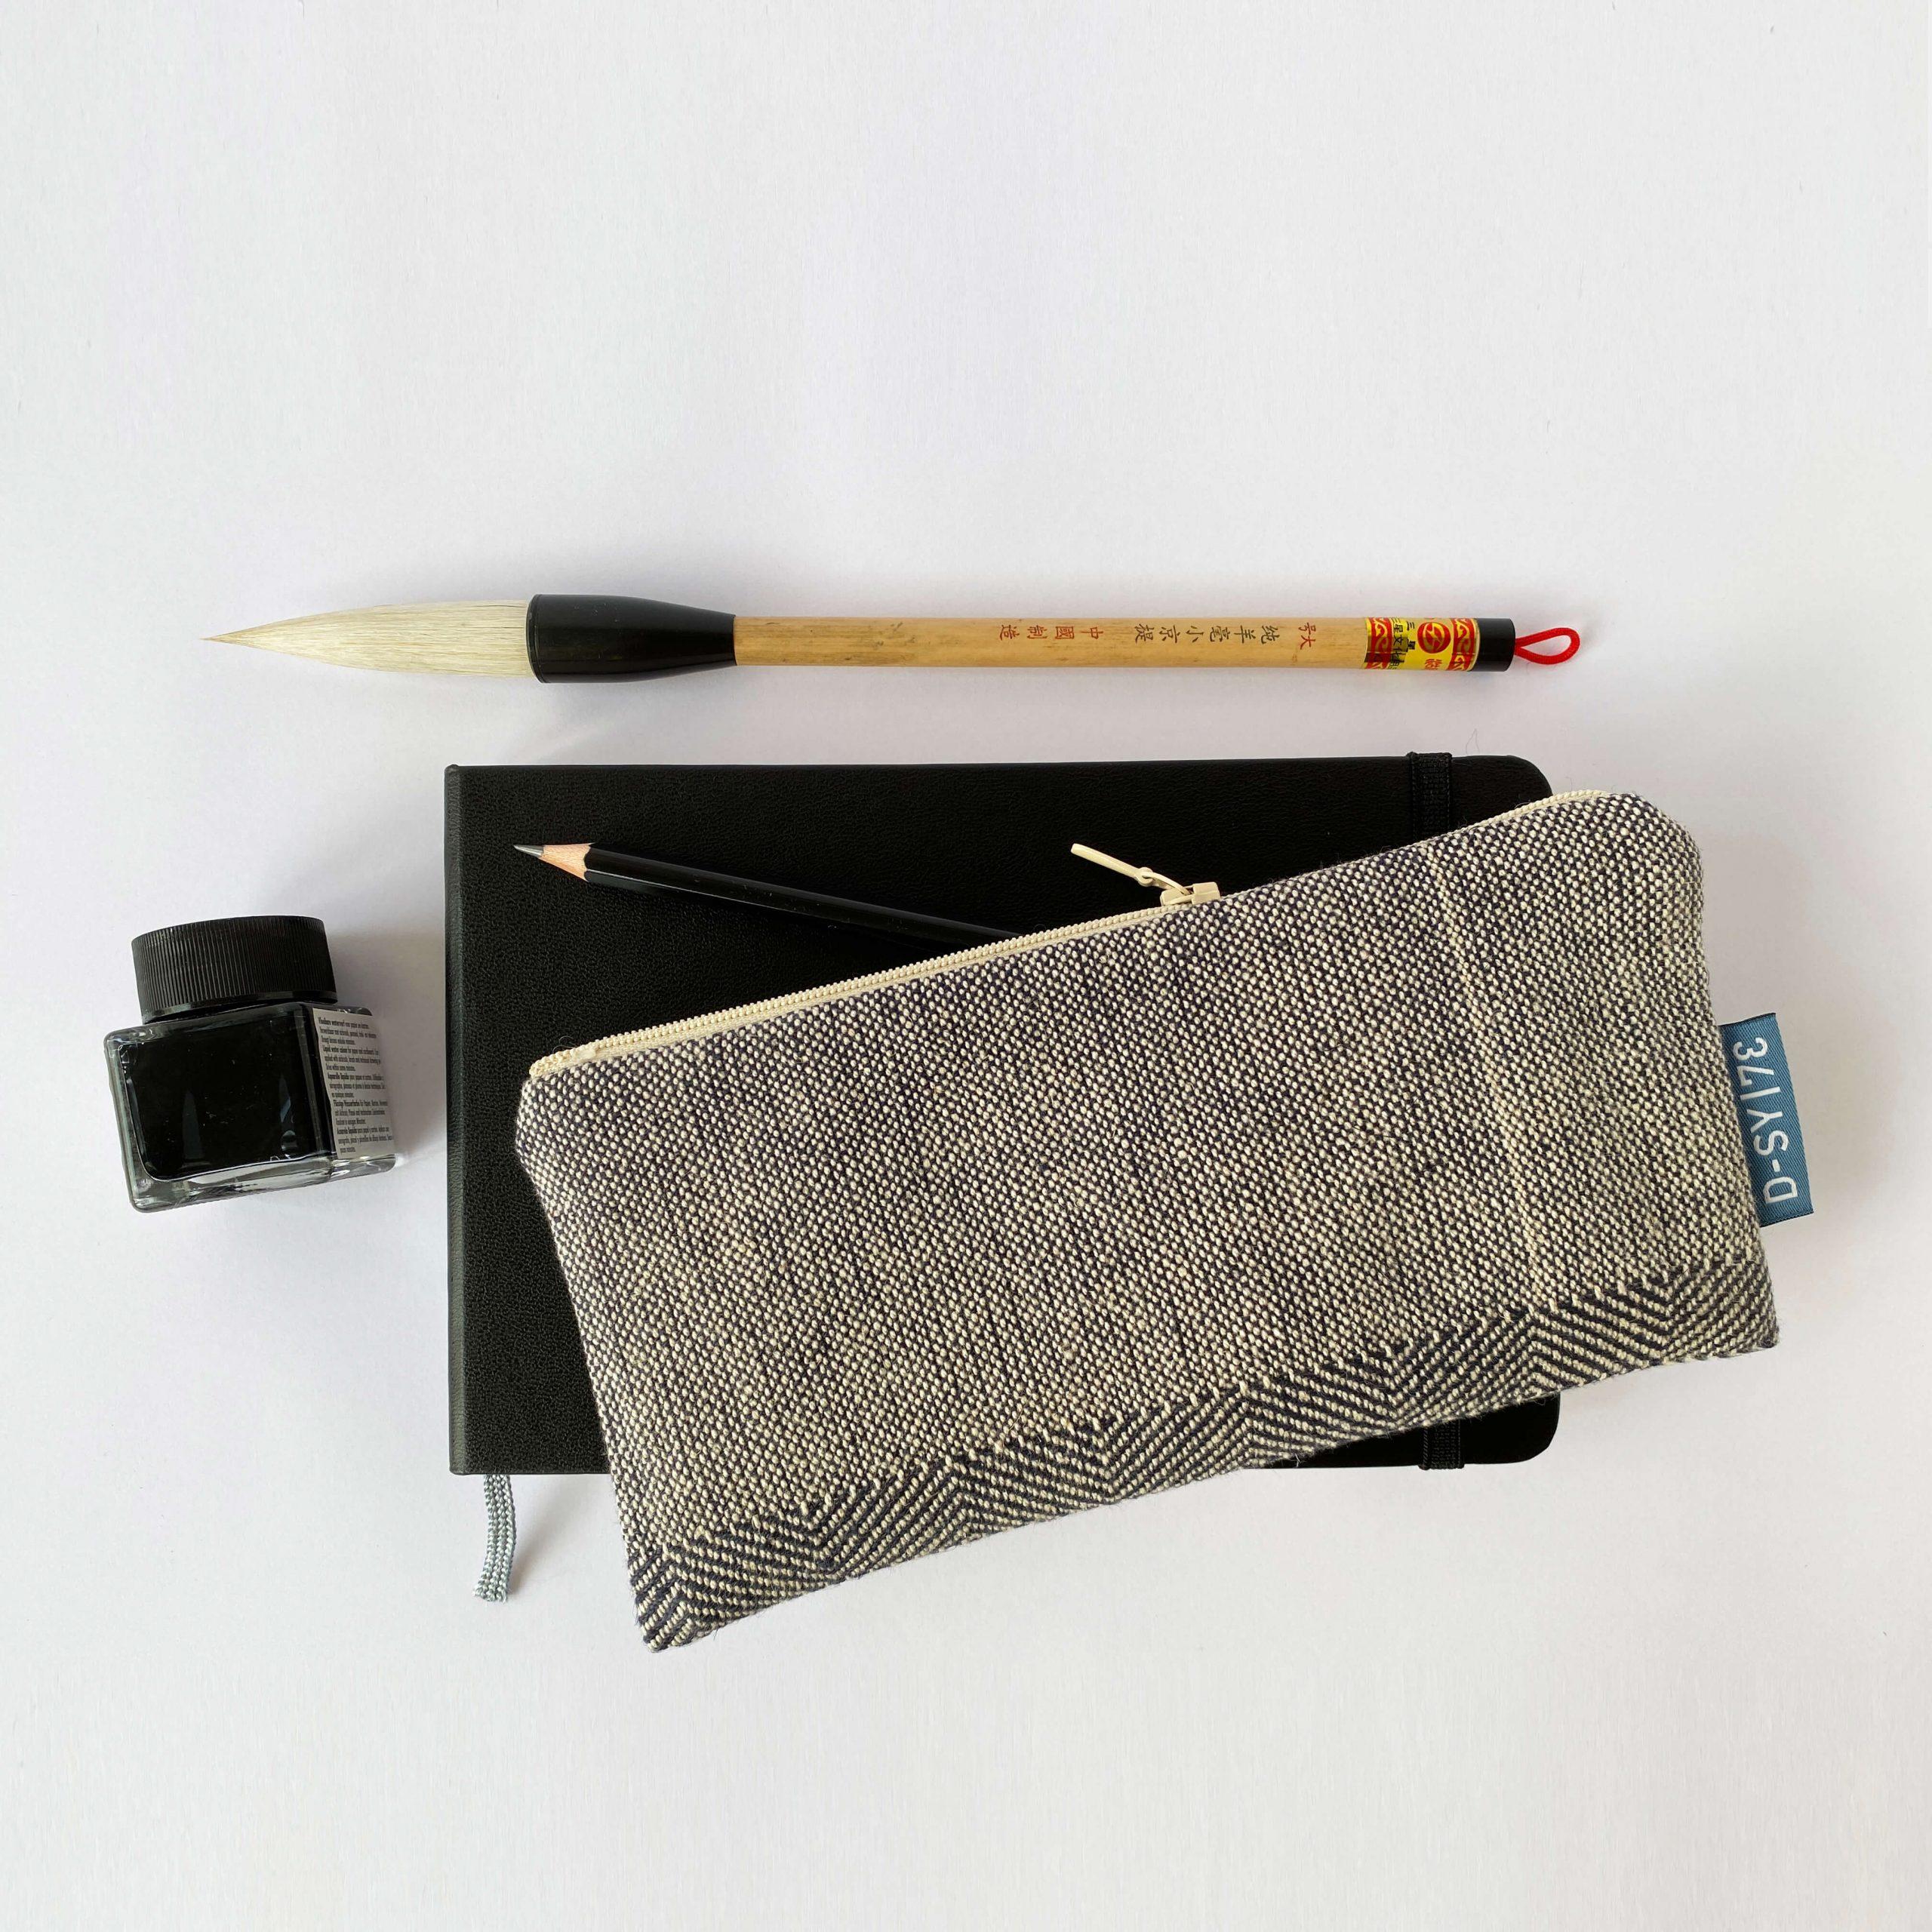 Zipperbag in point twill & plain weave (05ZB)